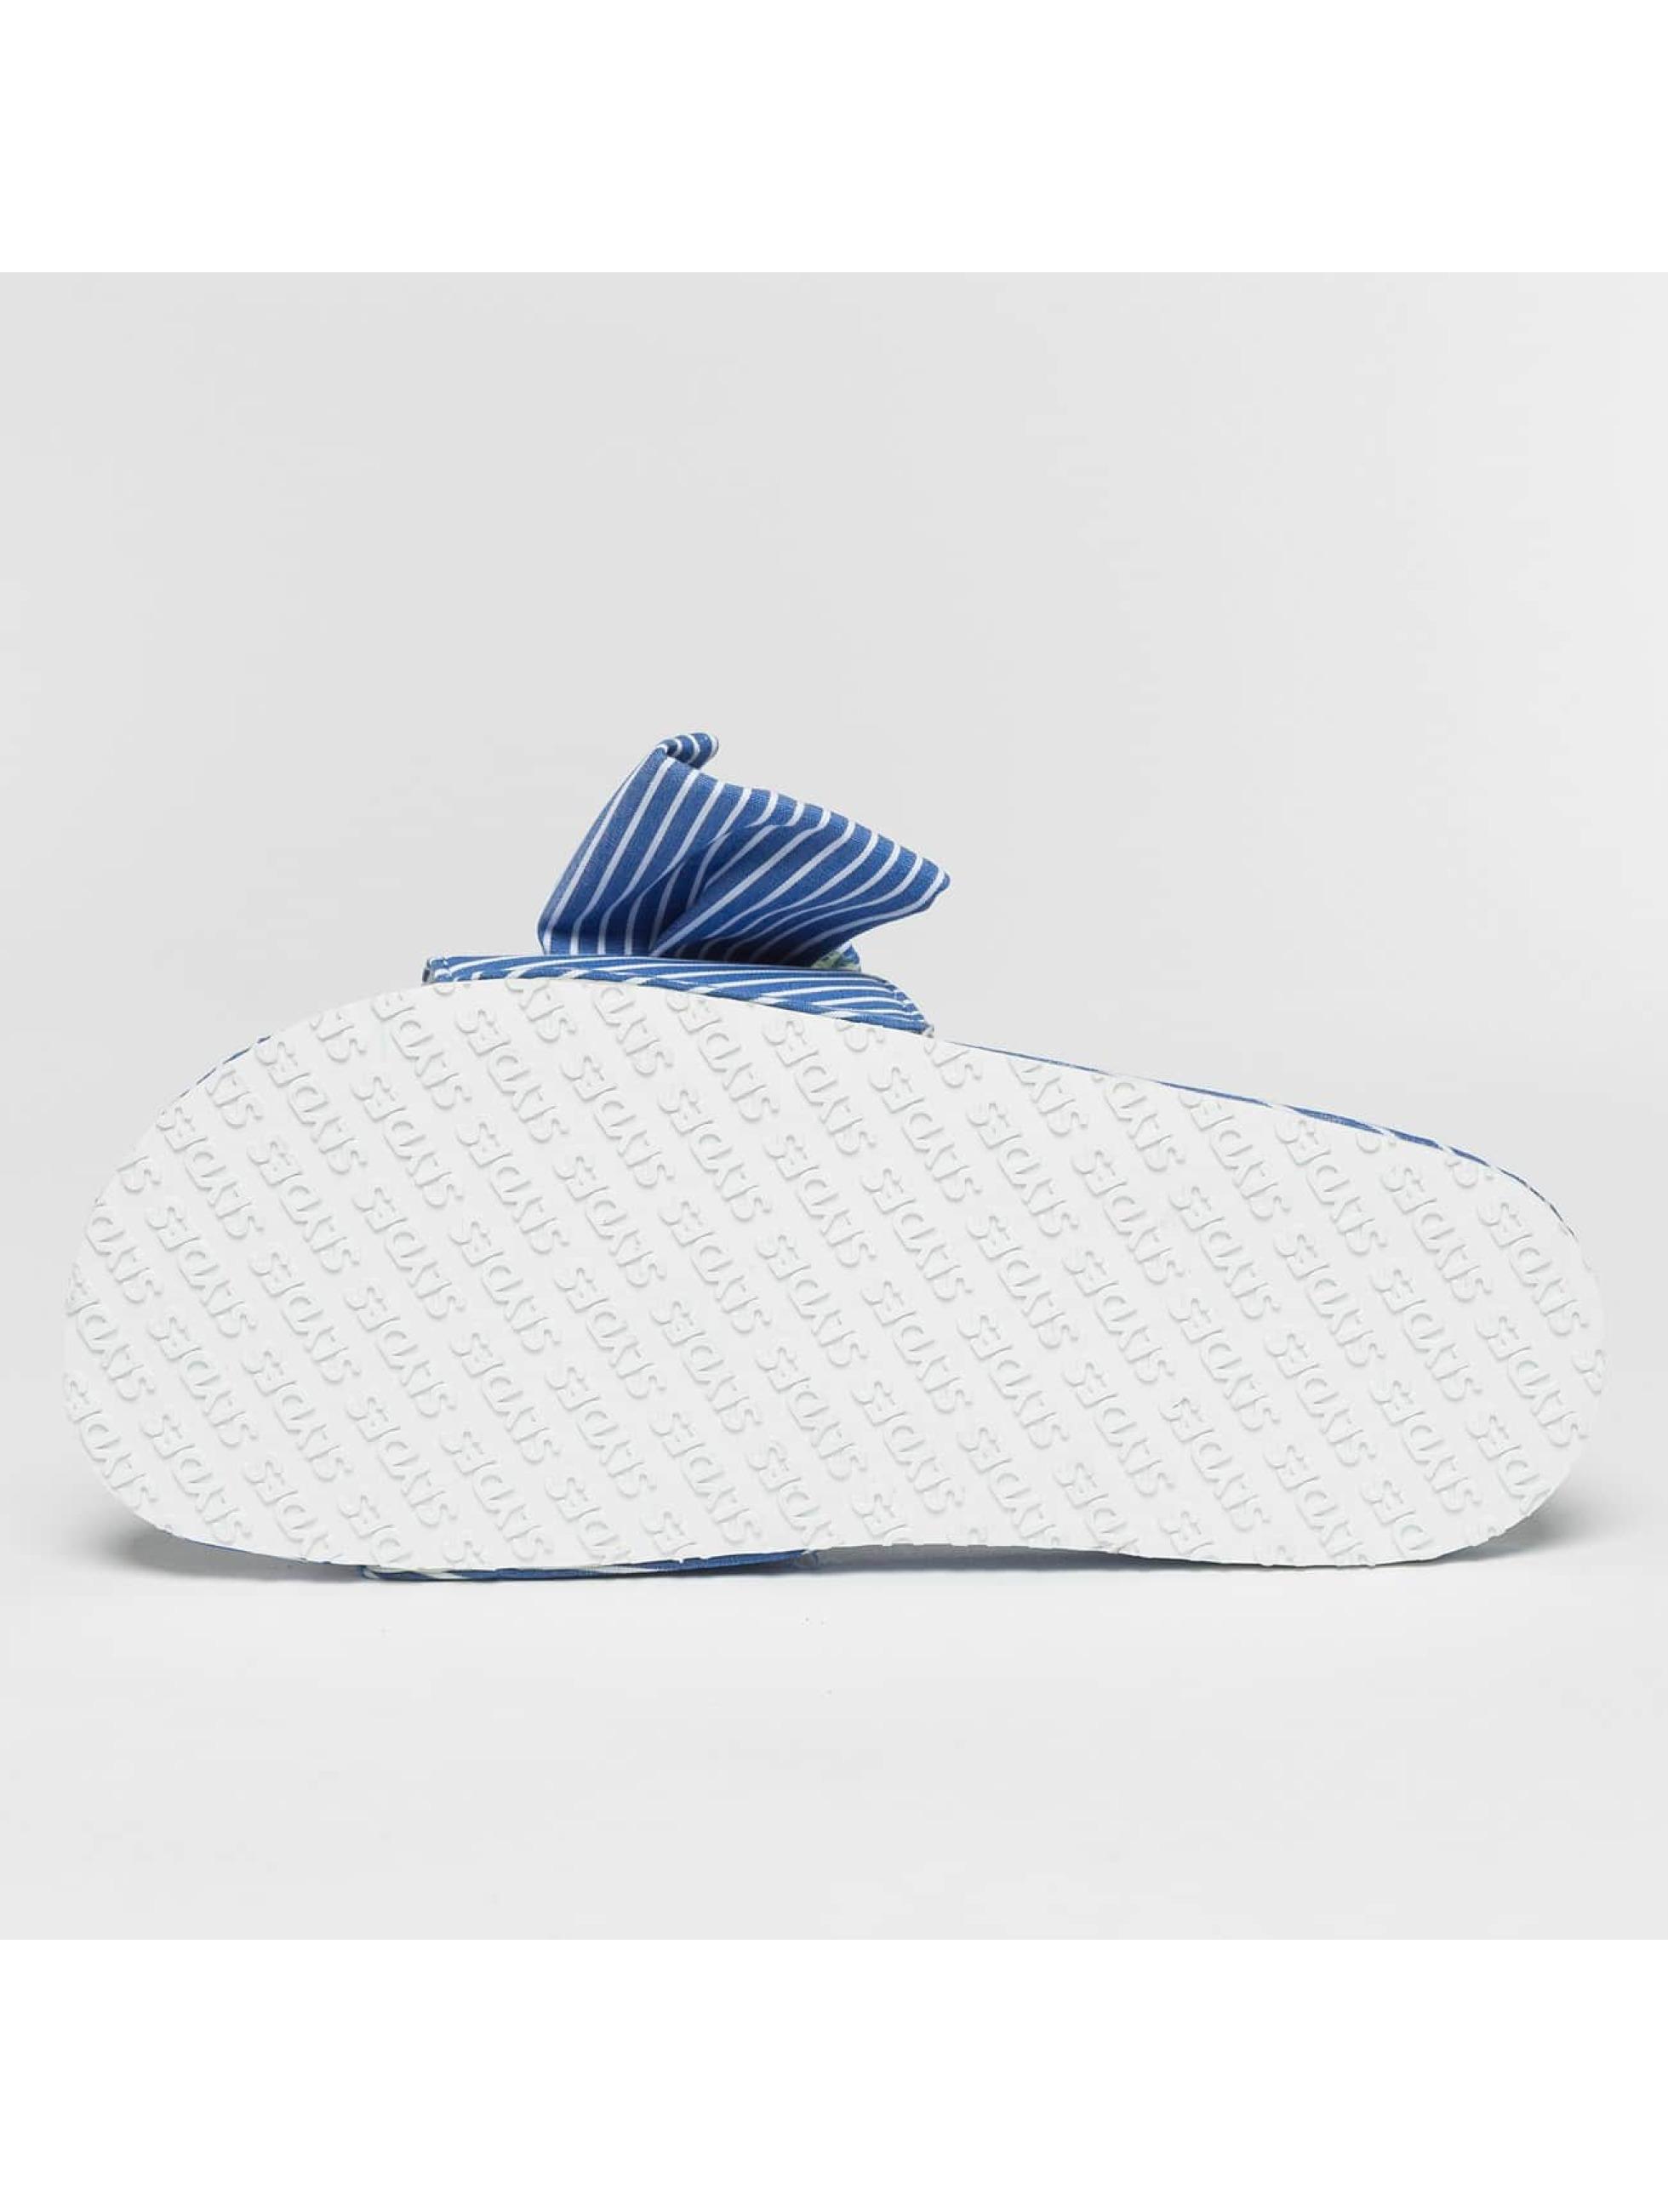 Slydes Sandals Brighton blue